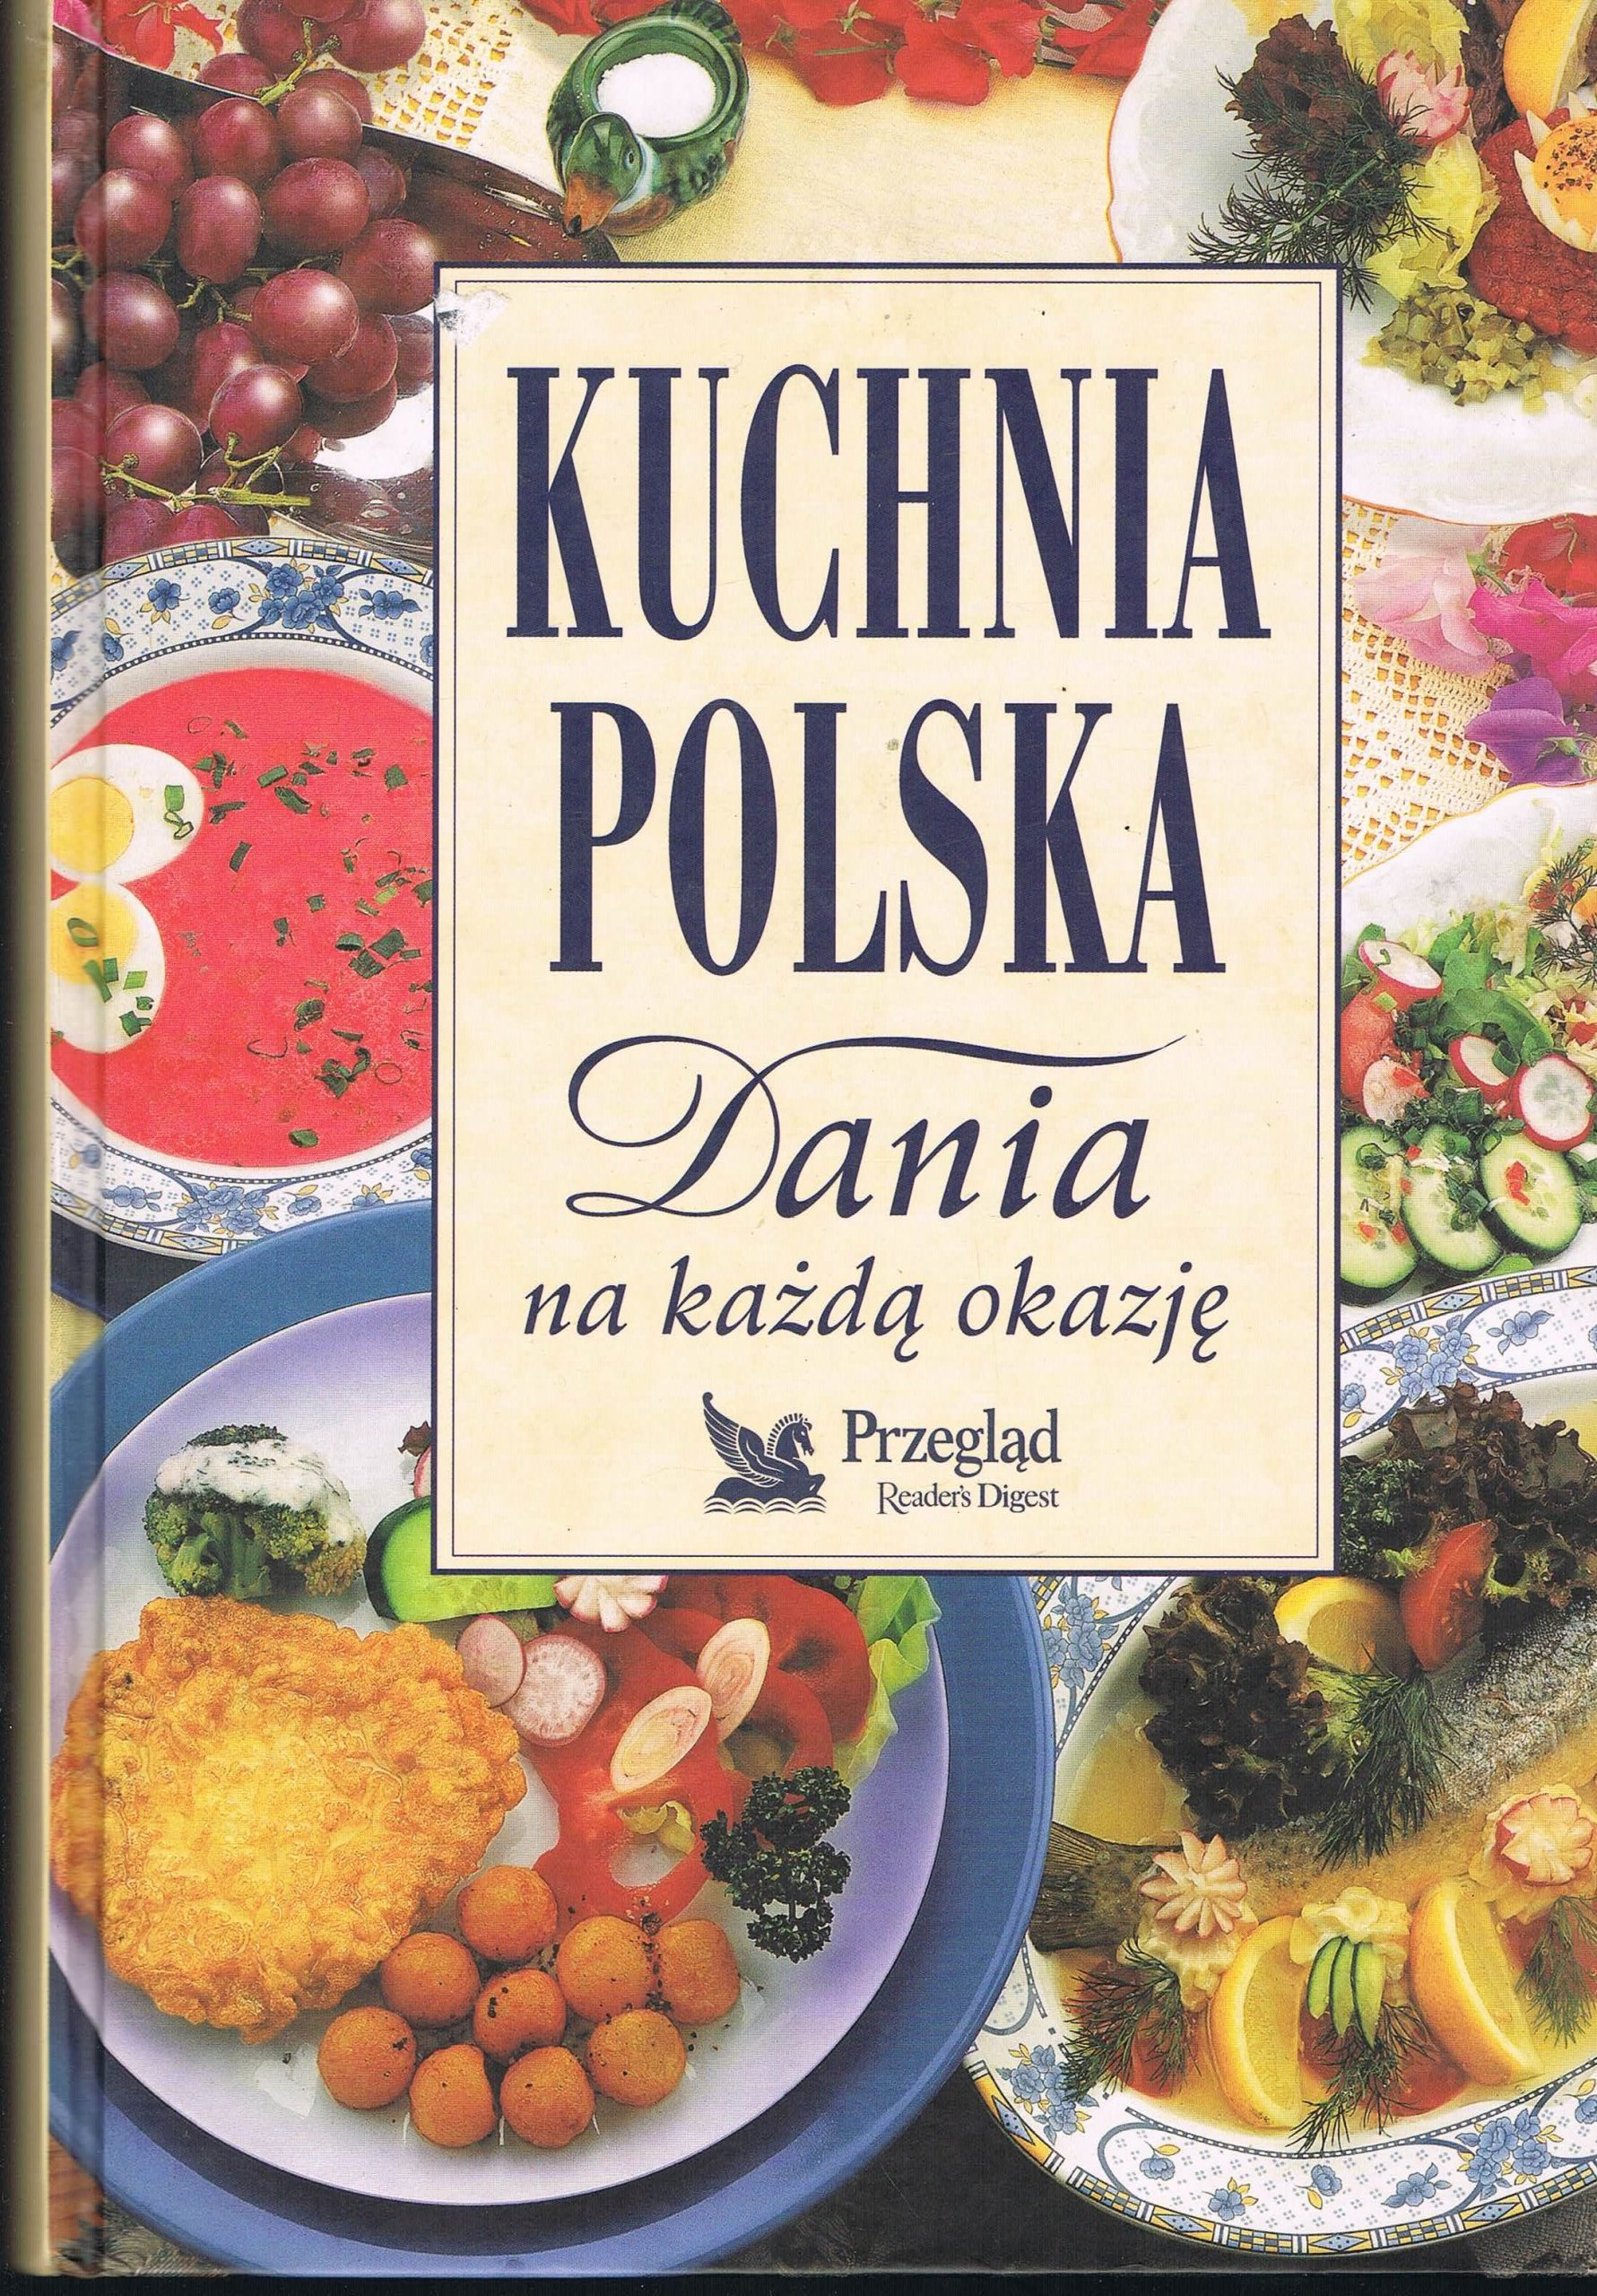 Kuchnia Polska Dania Na Kazda Okazje 7252213275 Oficjalne